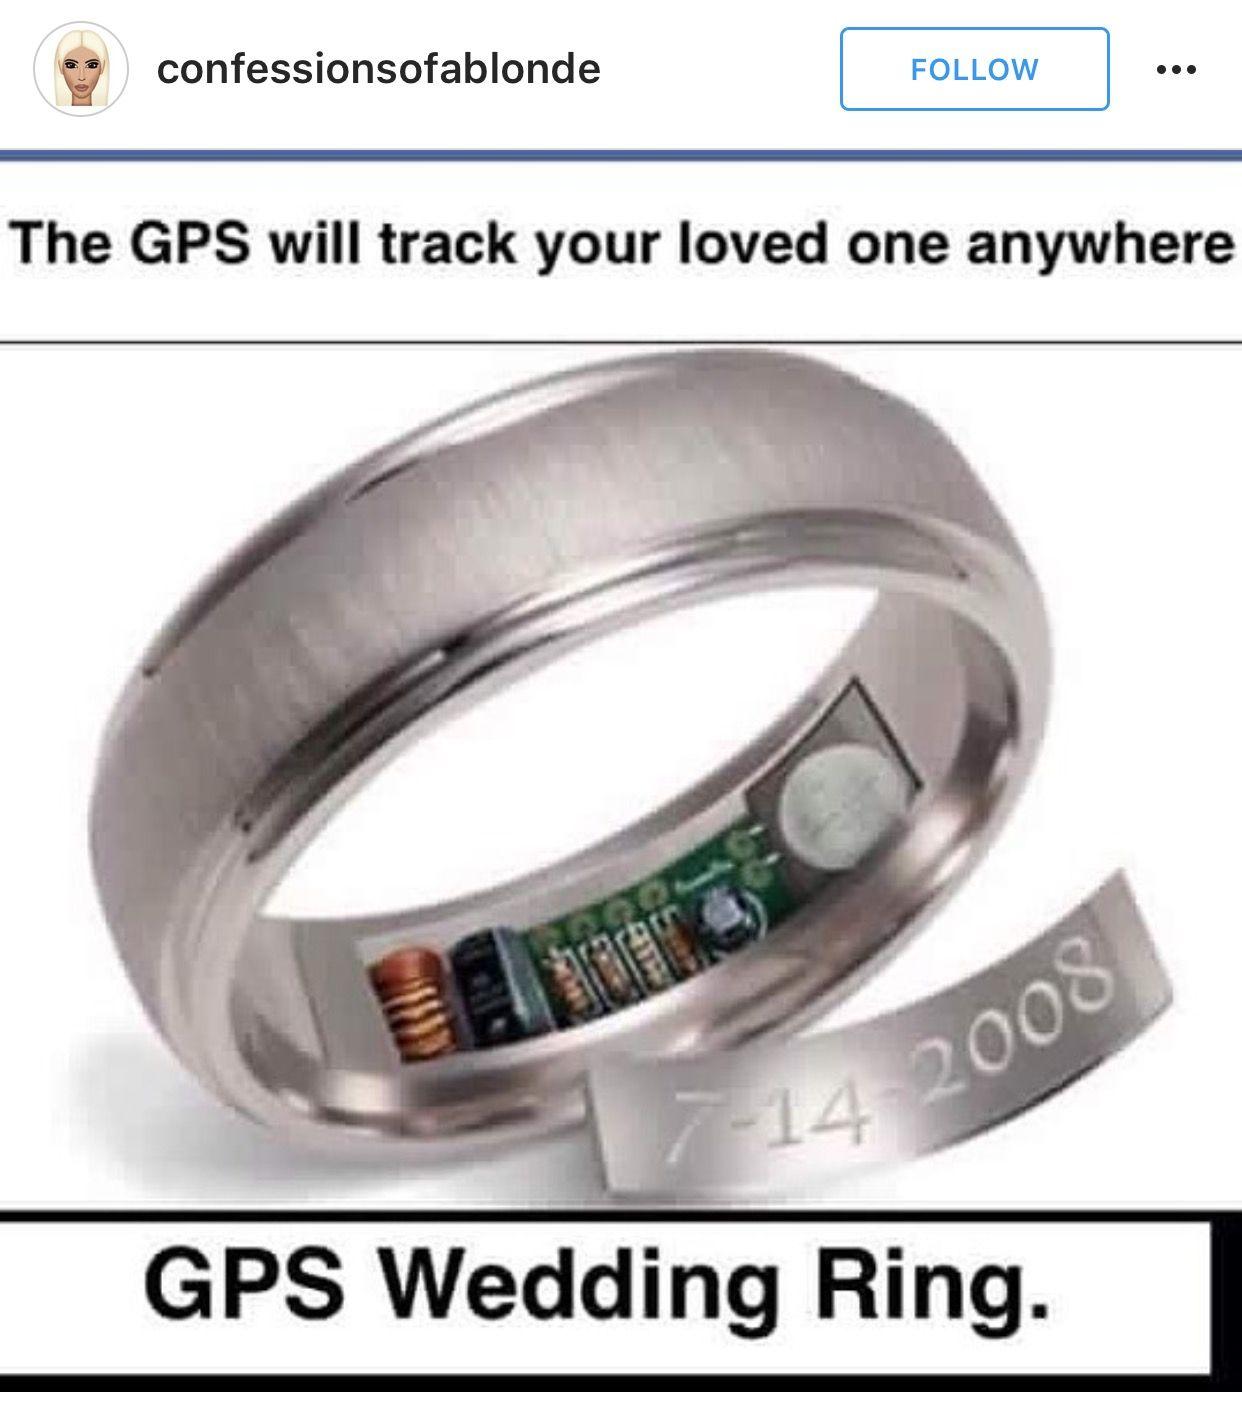 Gps Wedding Ring Rings Rings For Men Wedding Rings